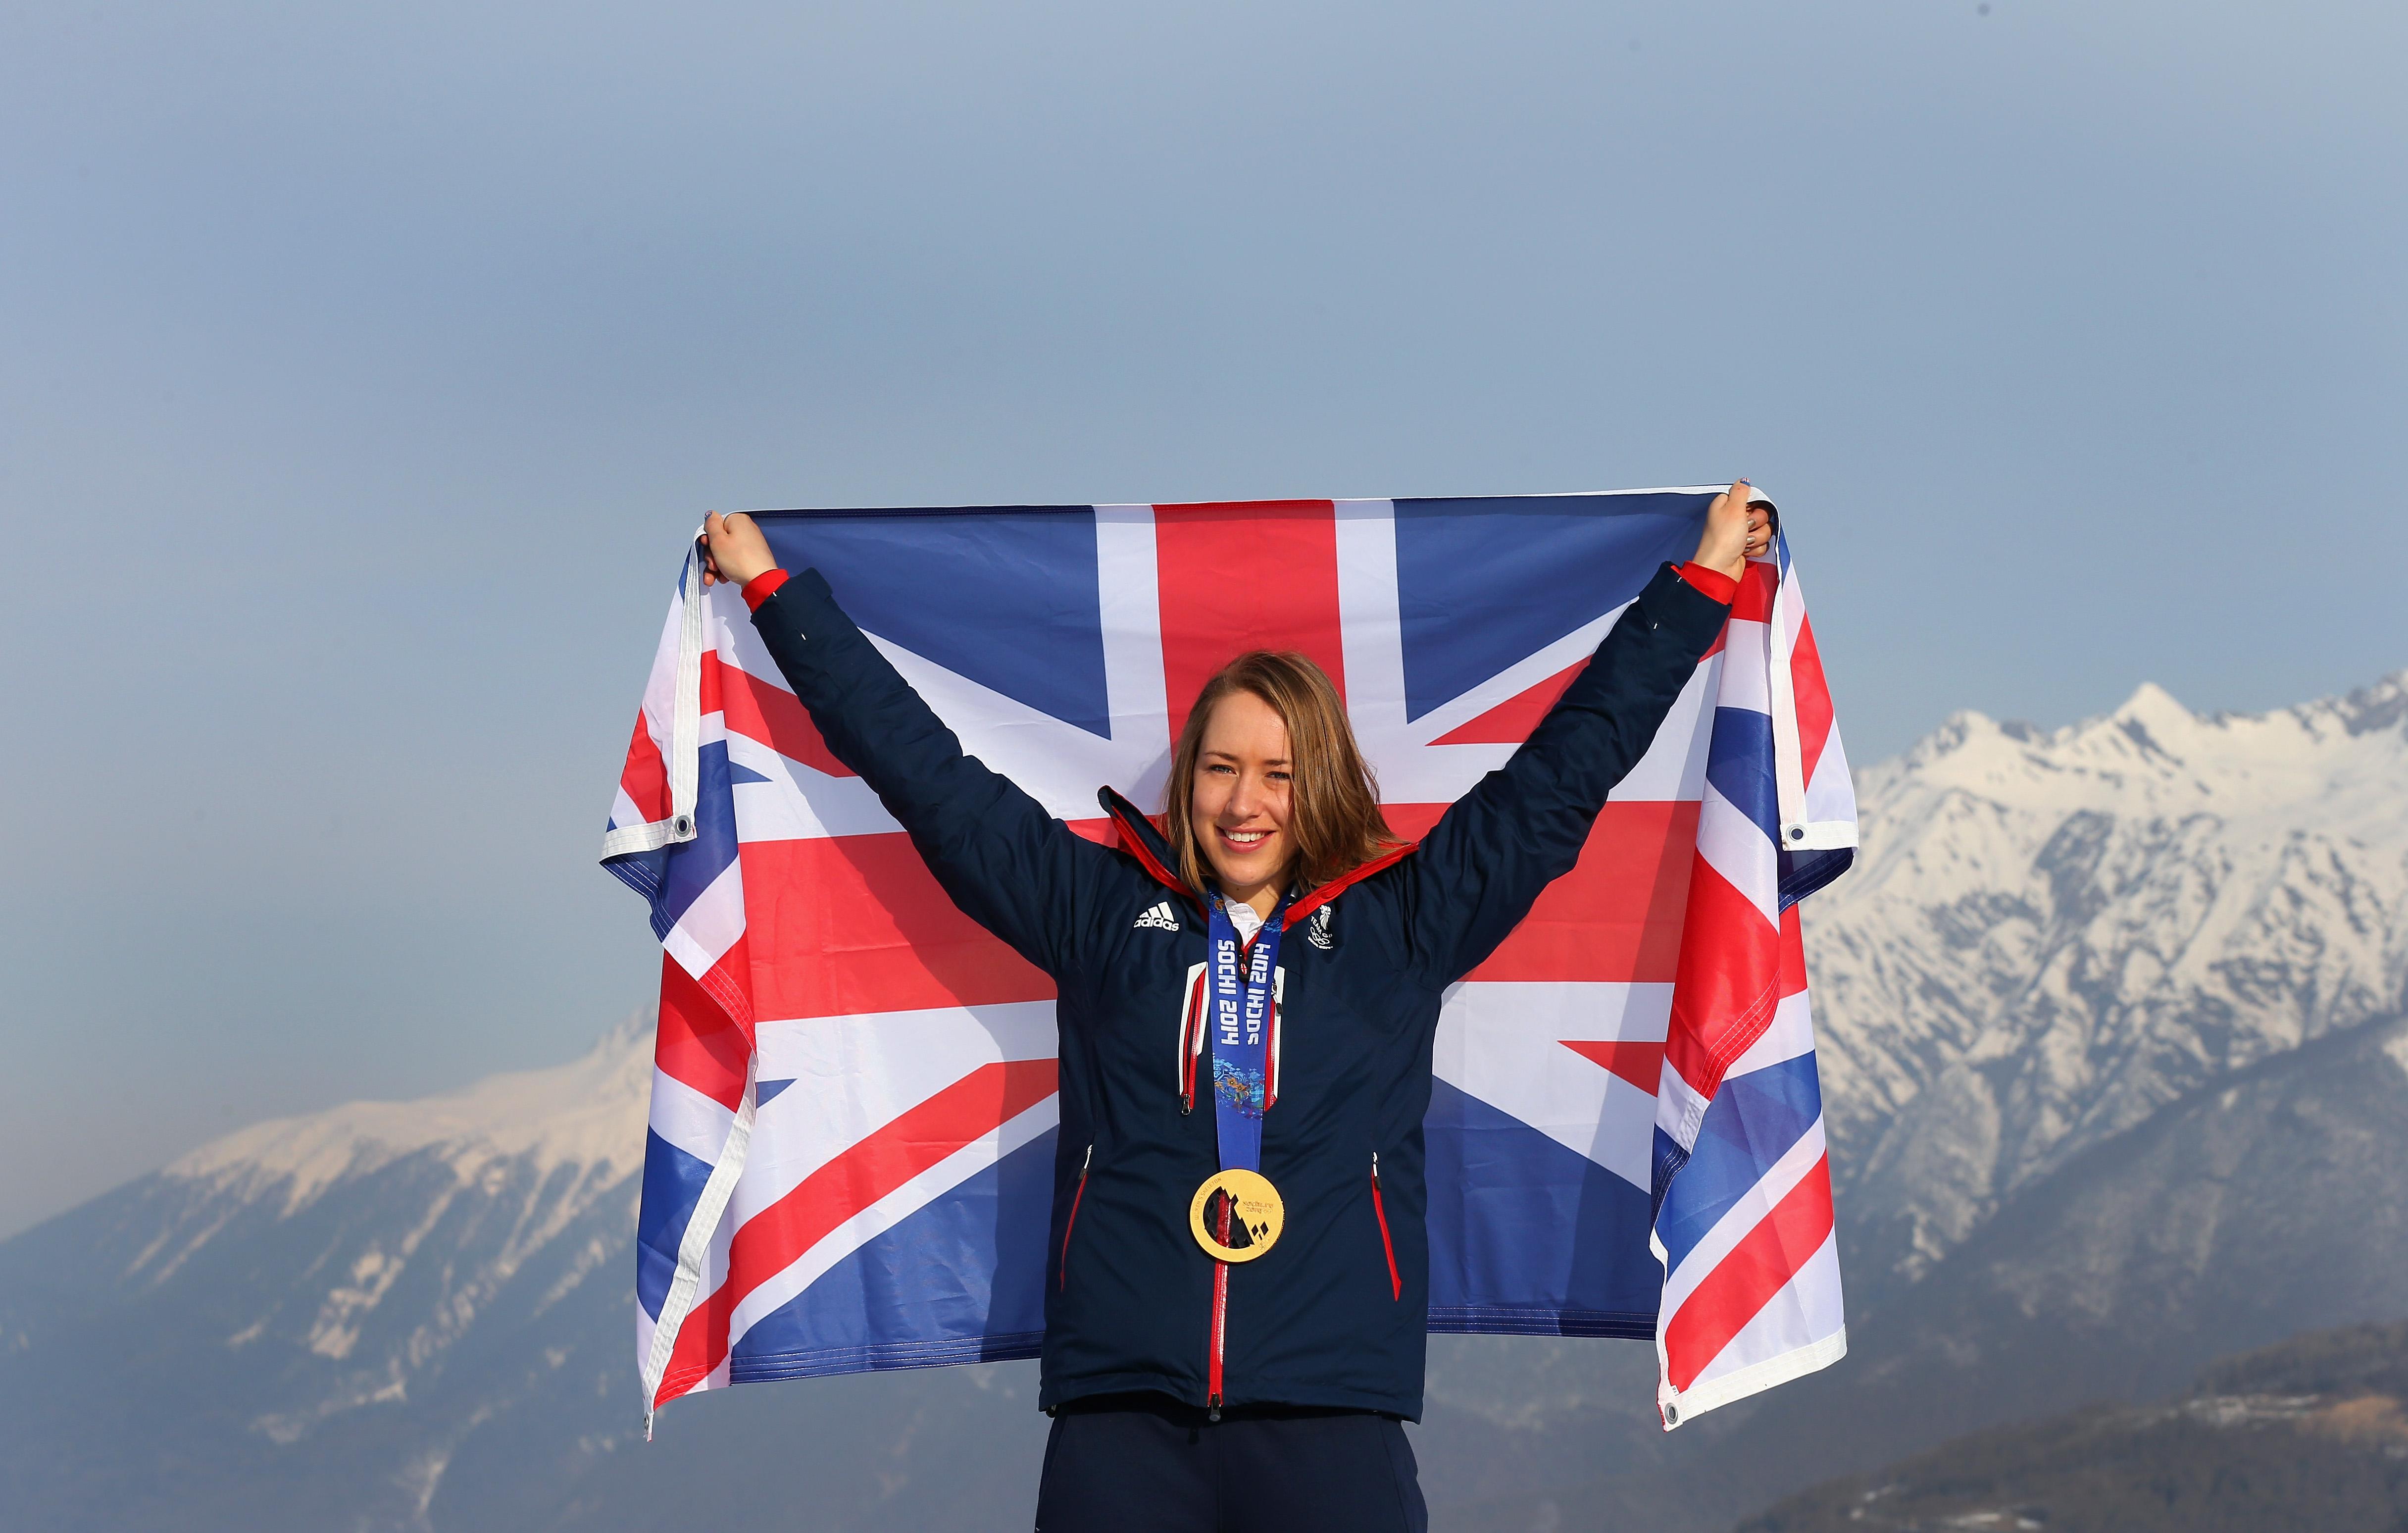 Lizzy Yarnold Winter Olympics gold medal Sochi 2014